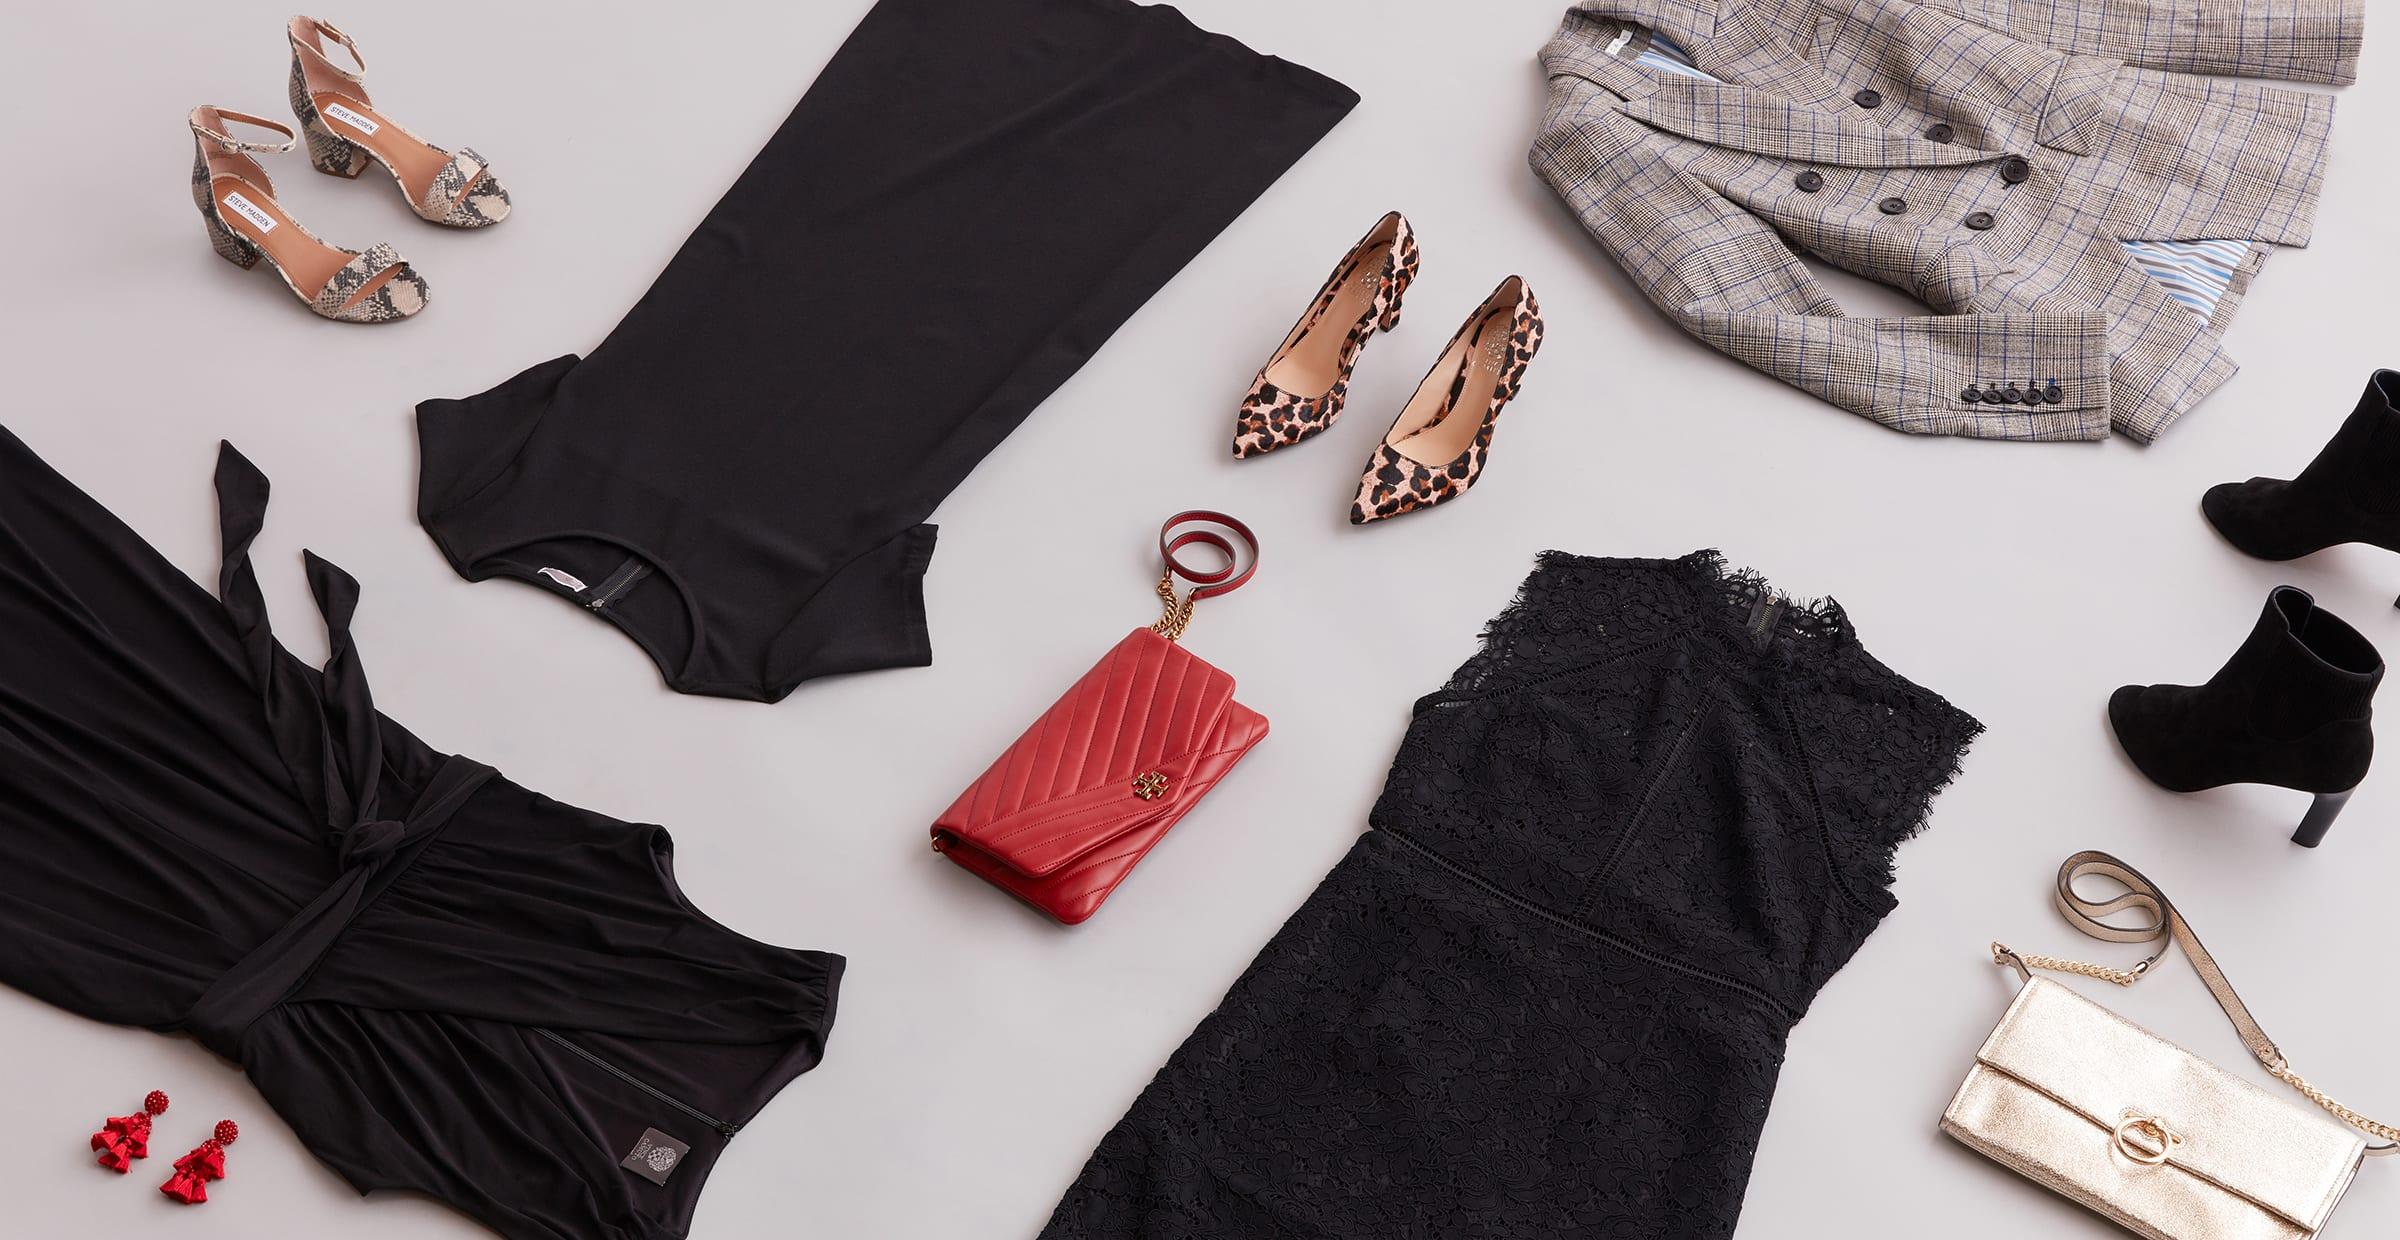 Little black dress outfits